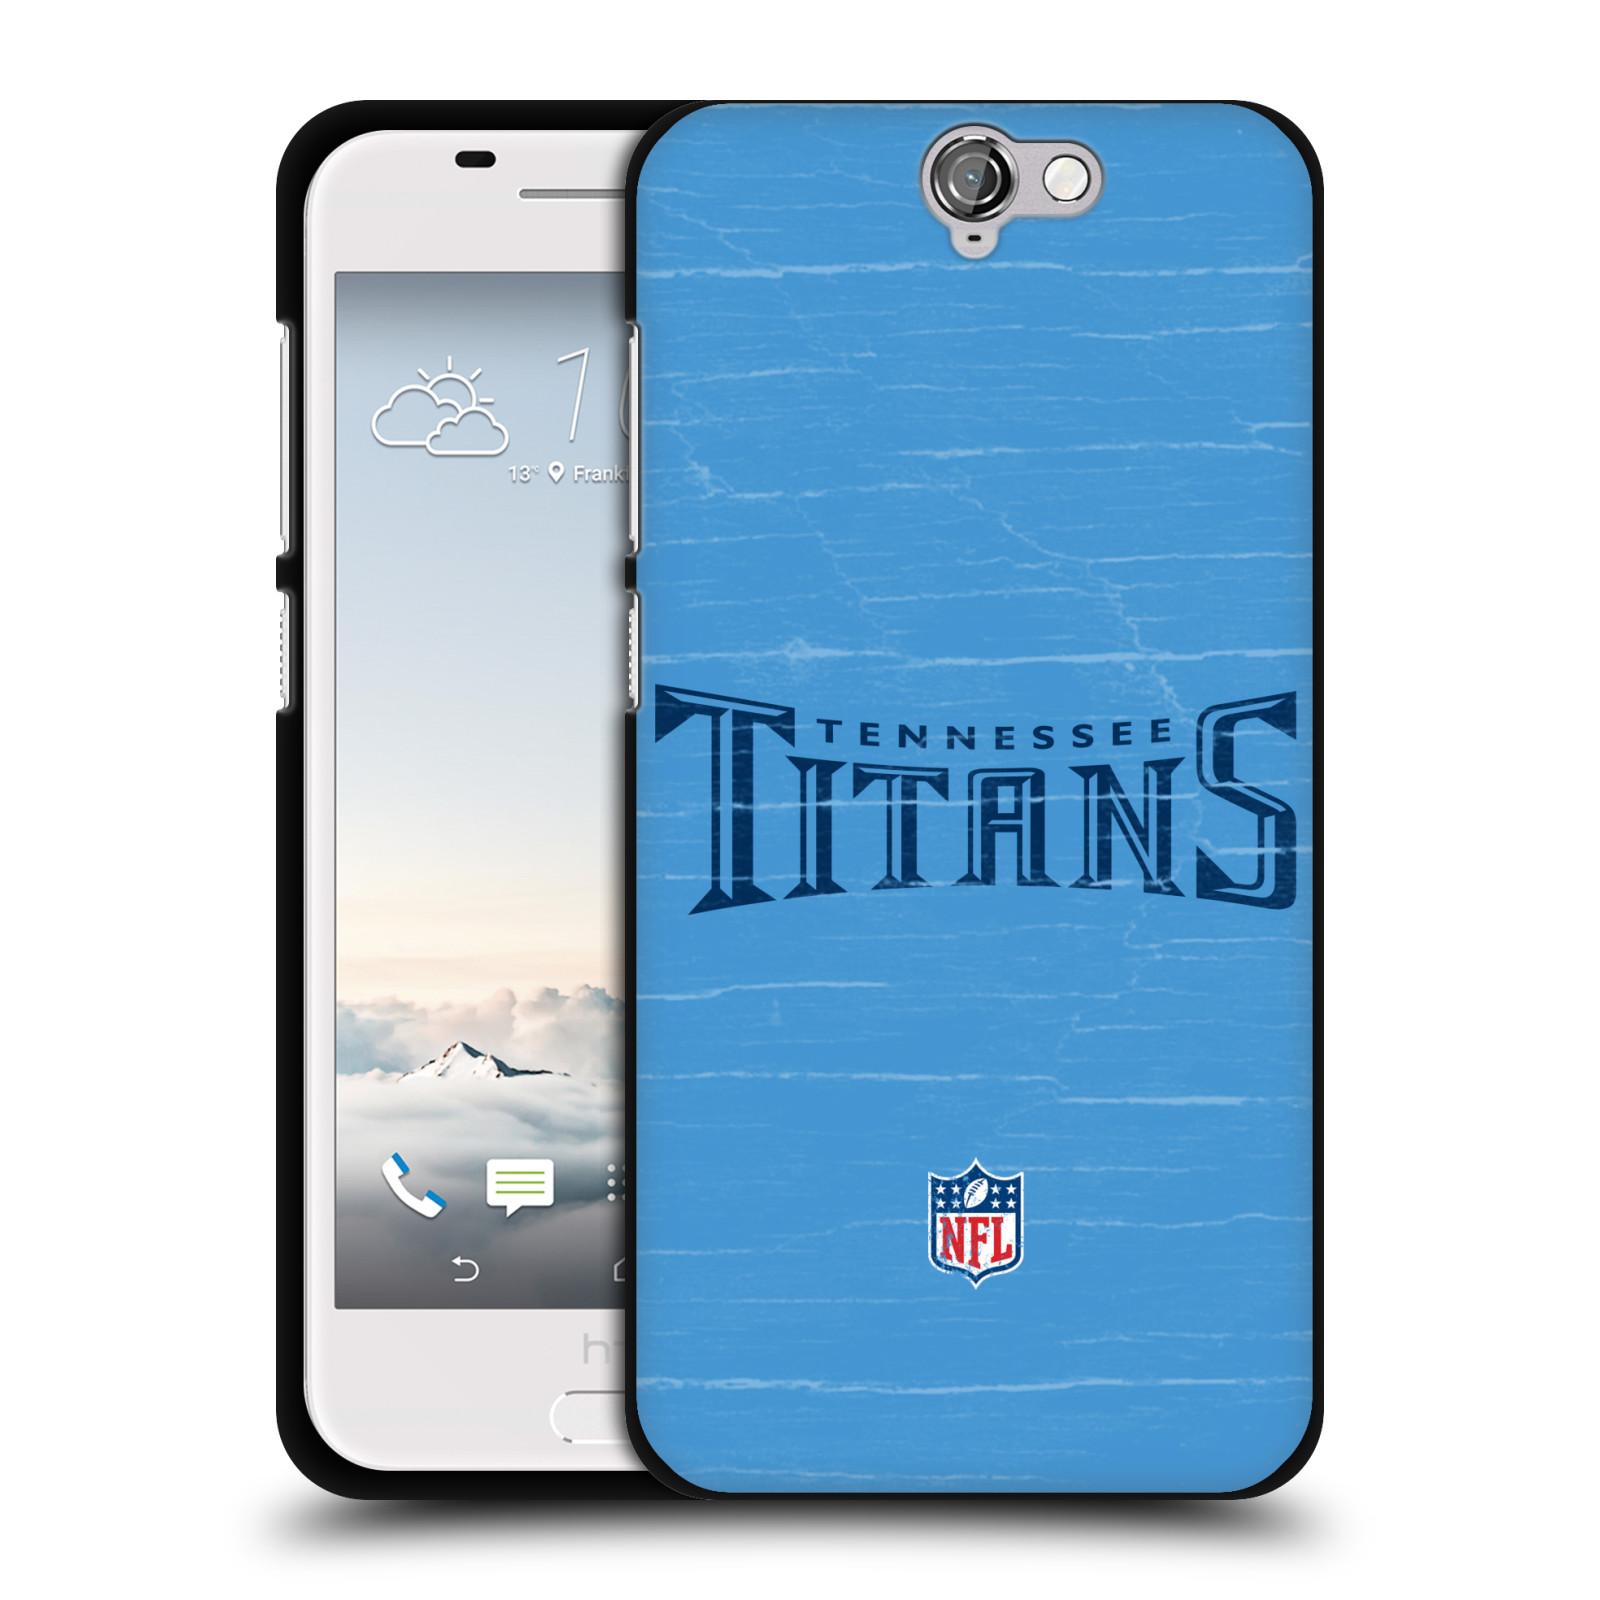 OFFIZIELLE-NFL-TENNESSEE-TITANS-LOGO-SOFT-GEL-HULLE-SCHWARZ-FUR-HTC-HANDYS